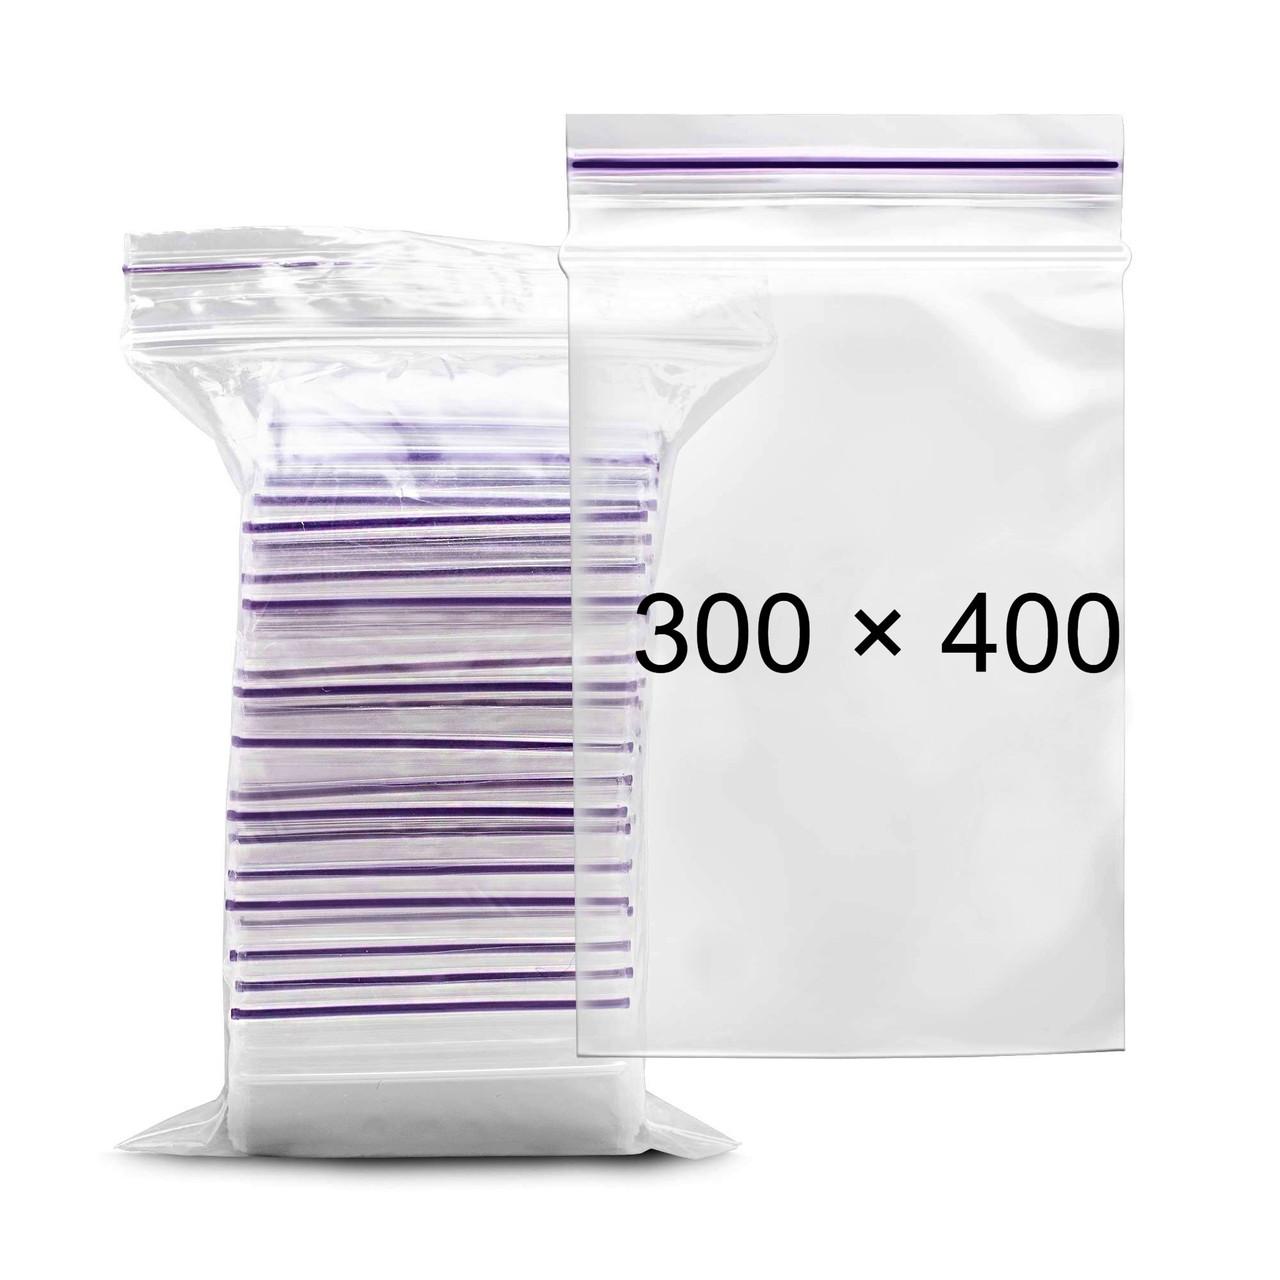 Пакеты с замком Zip-Lock - 300 × 400